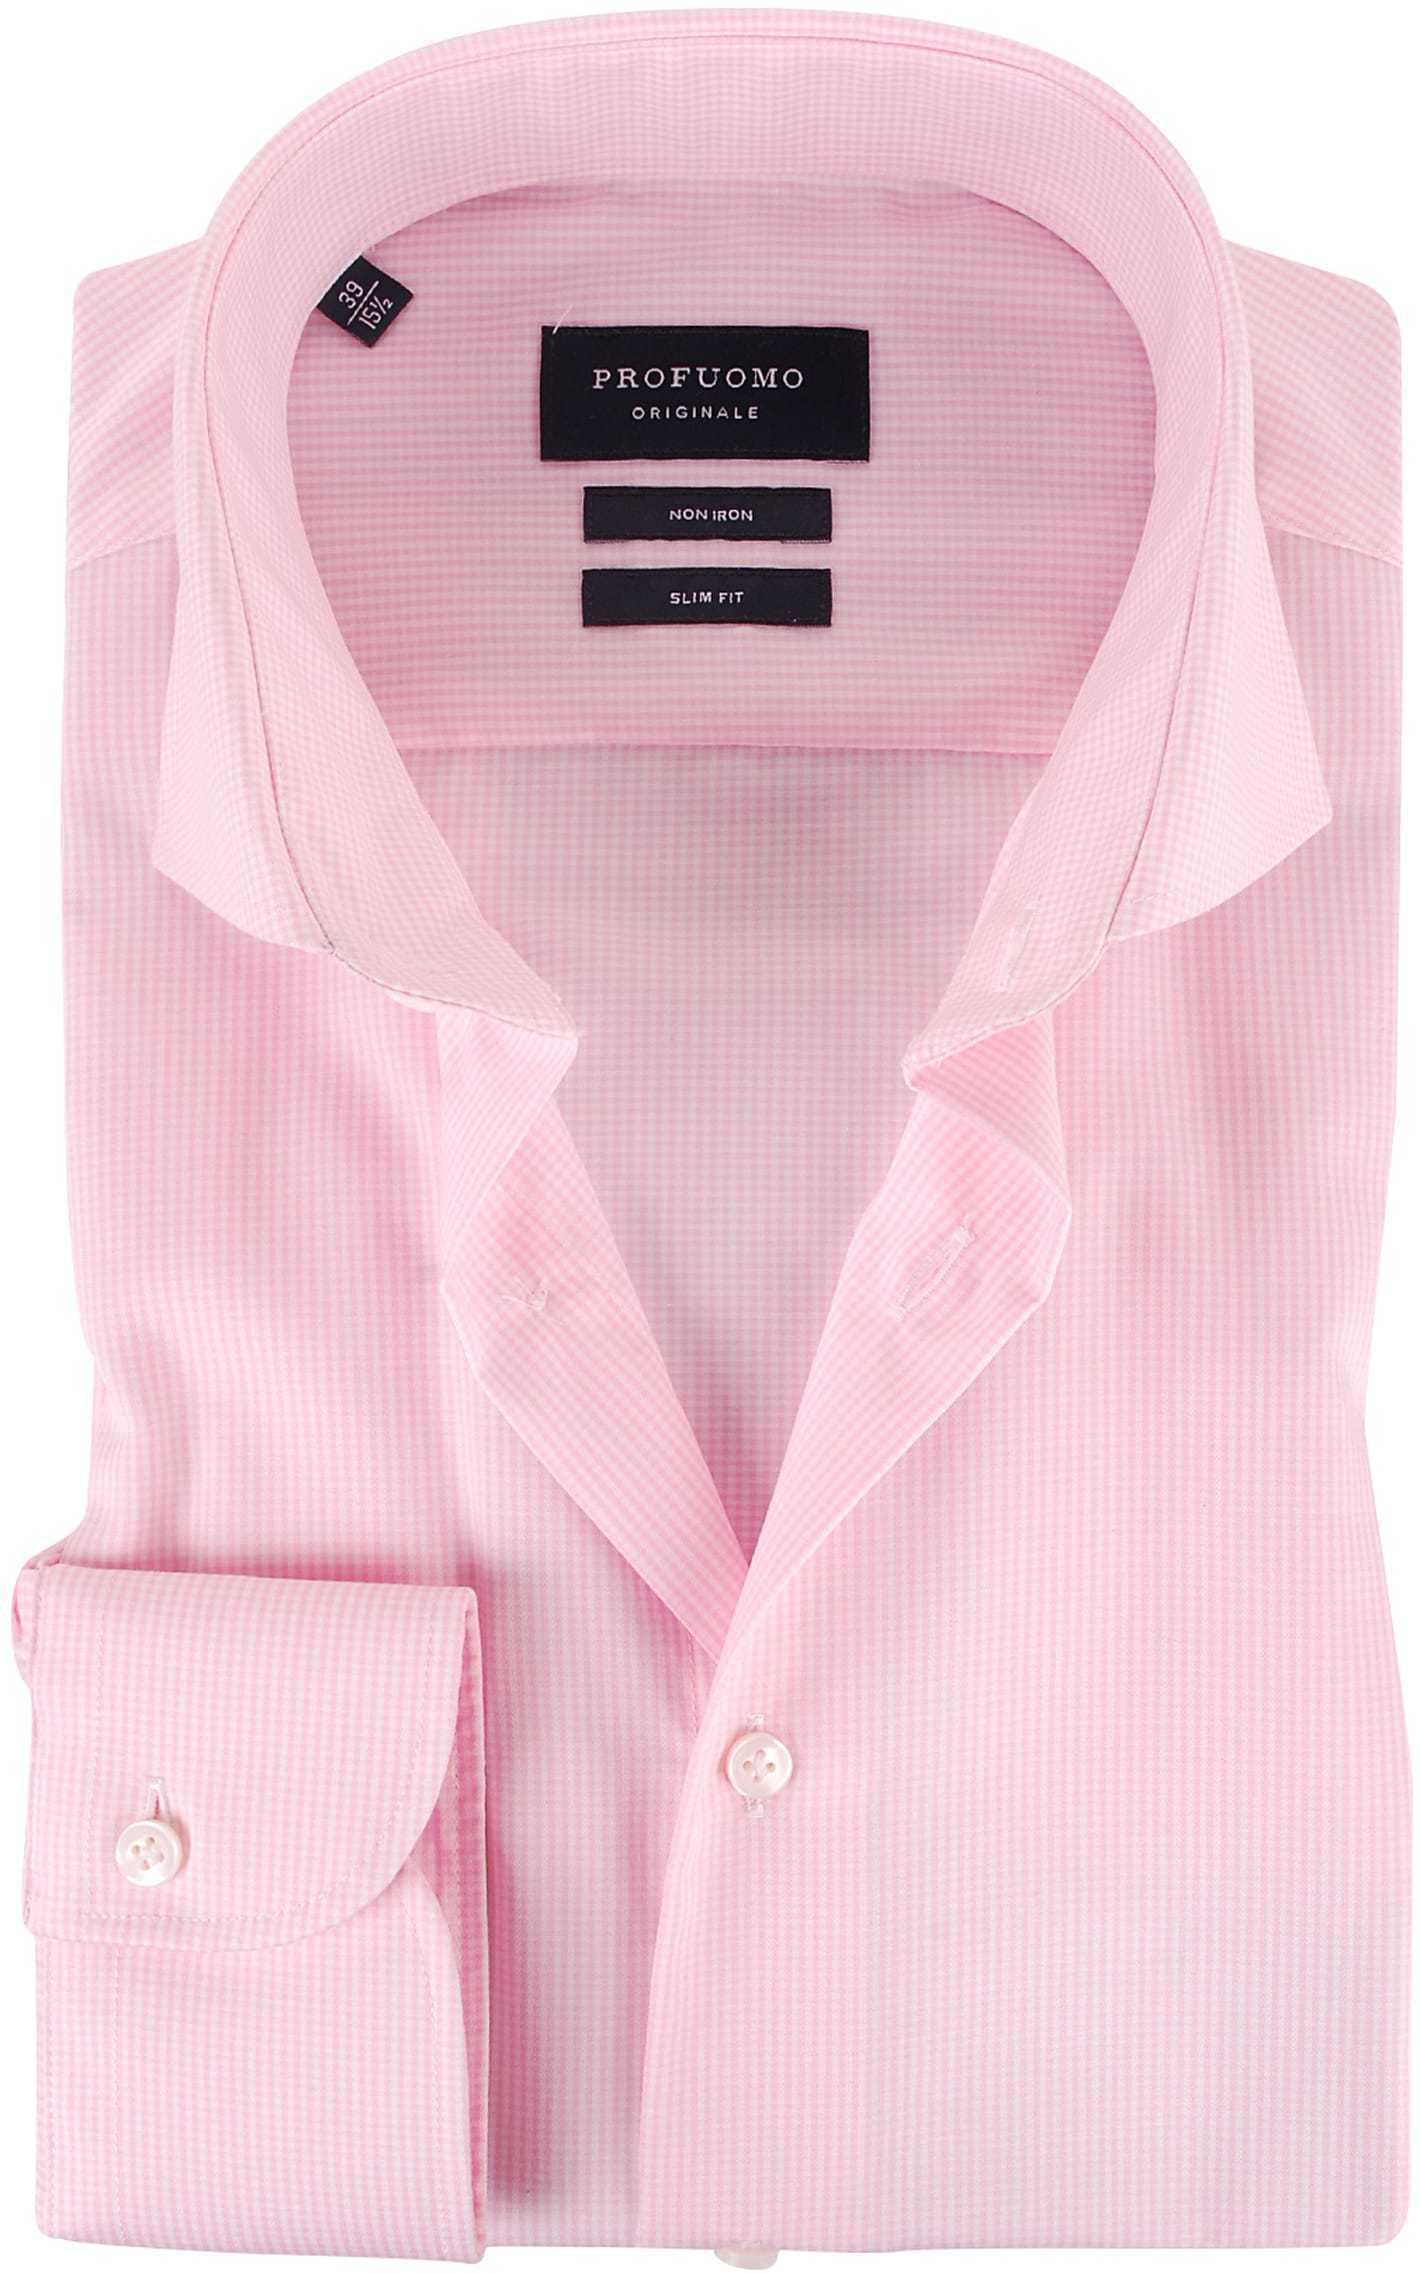 Profuomo Shirt Cutaway Pink foto 0